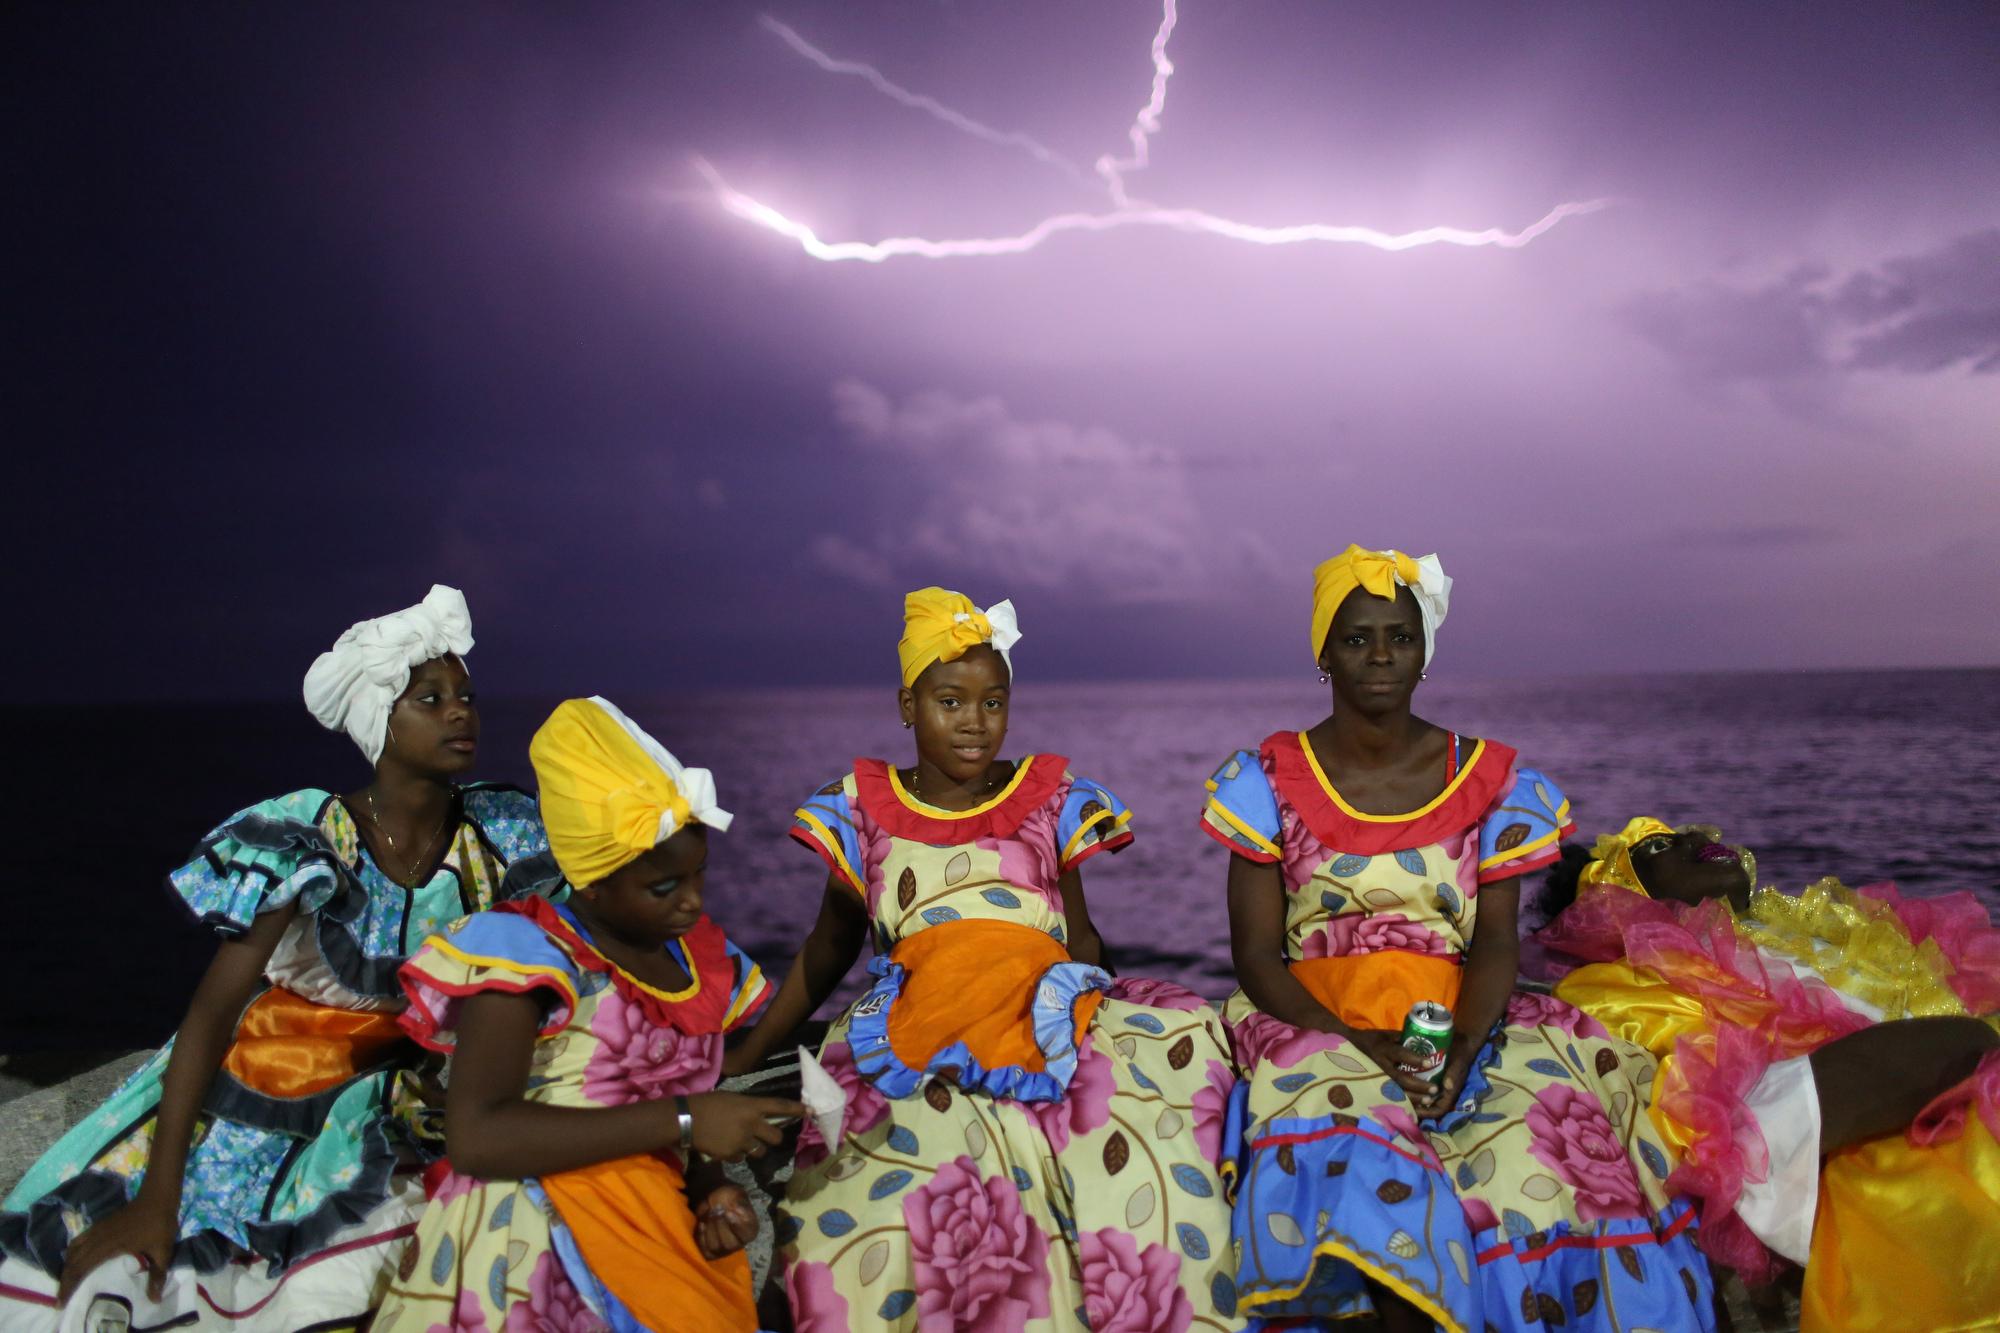 Carnival in Cuba - series